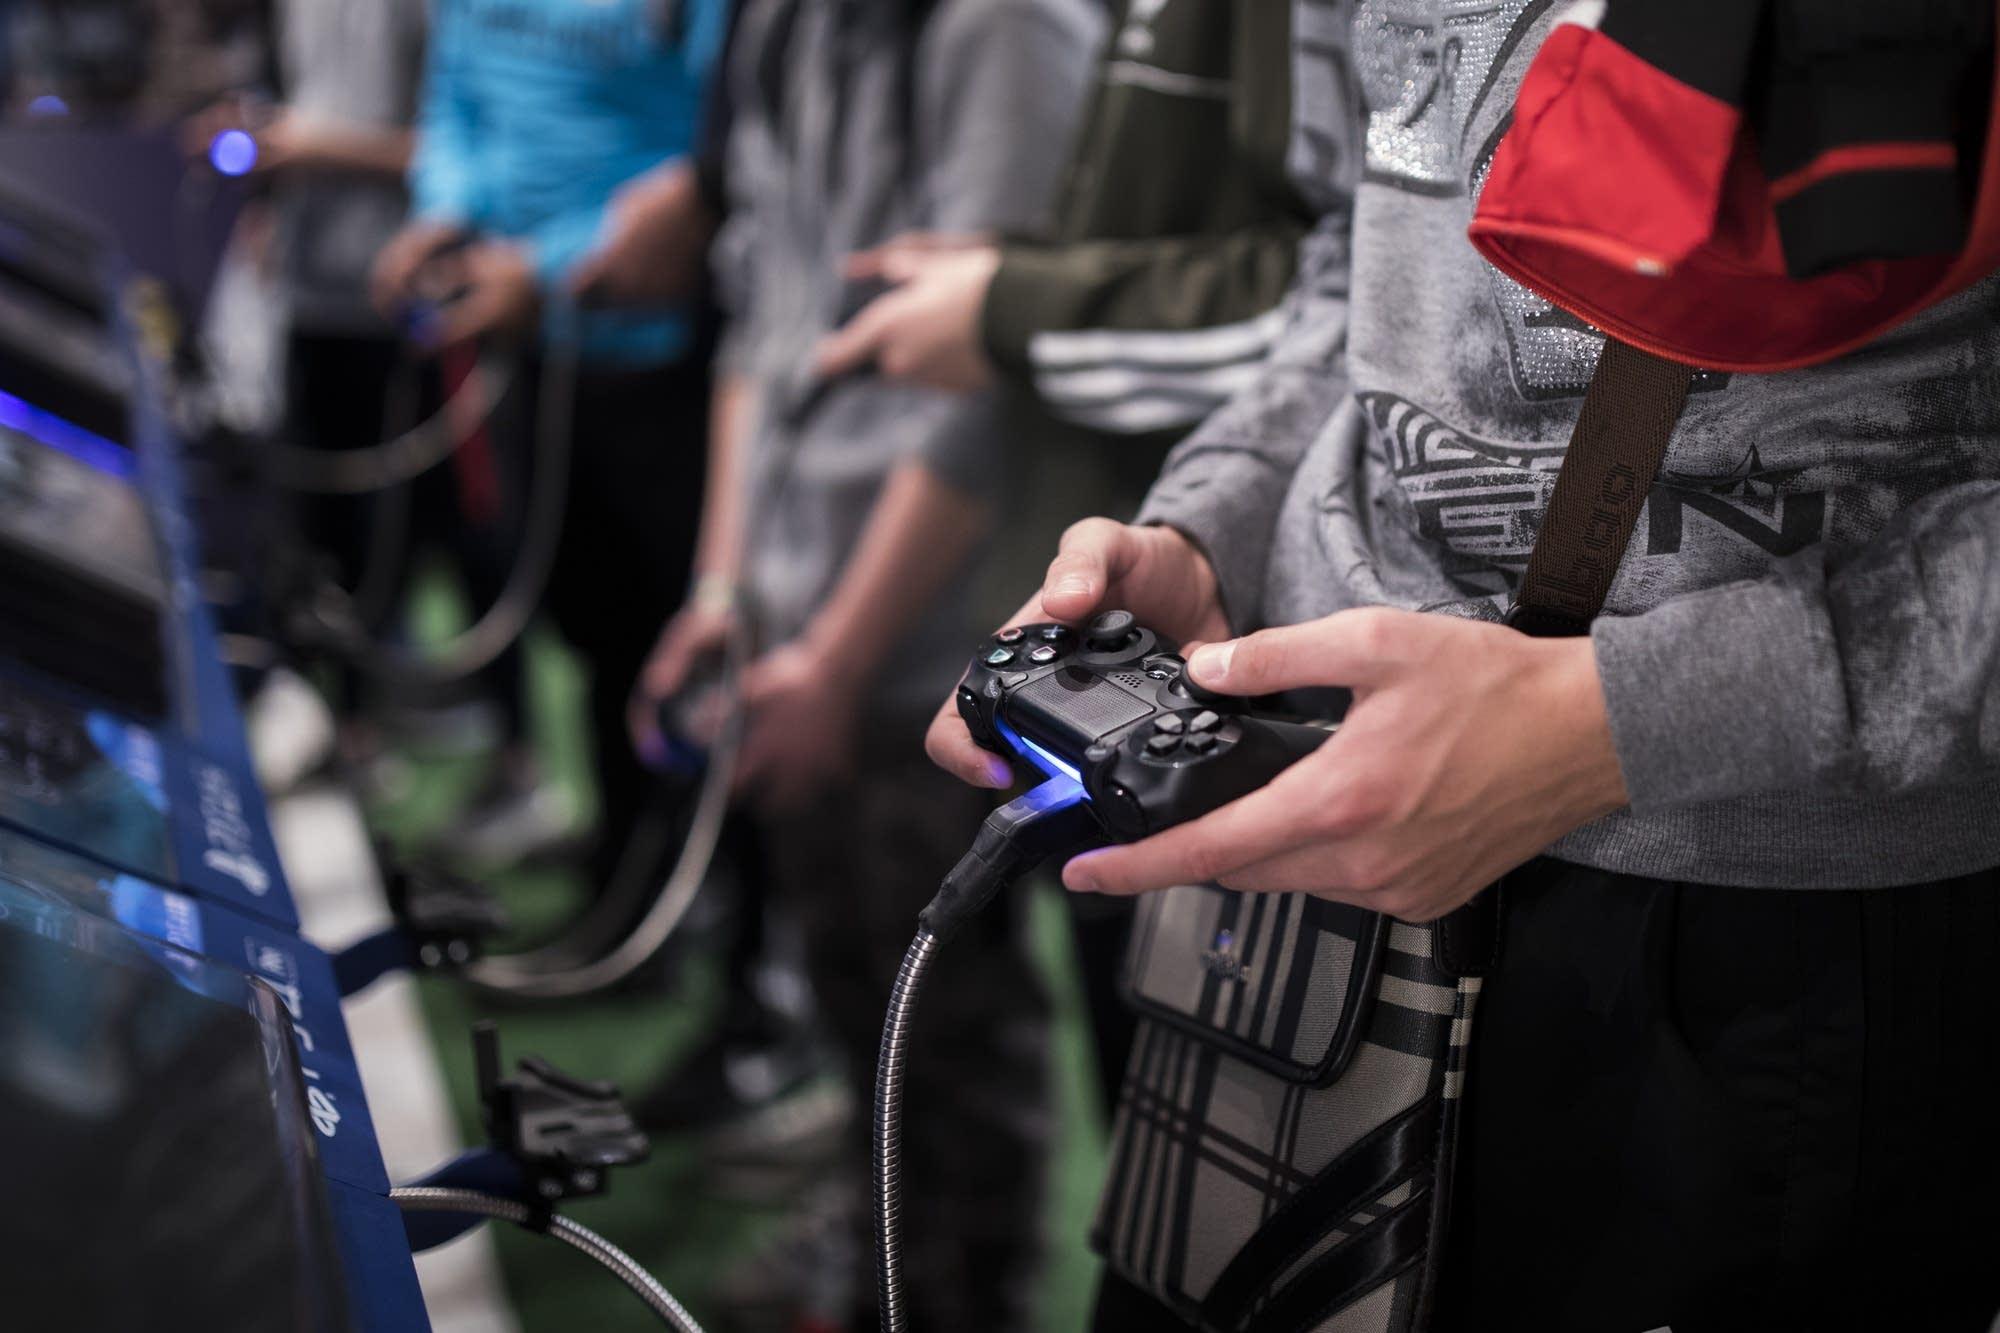 A man plays a game at the Paris Games Week.